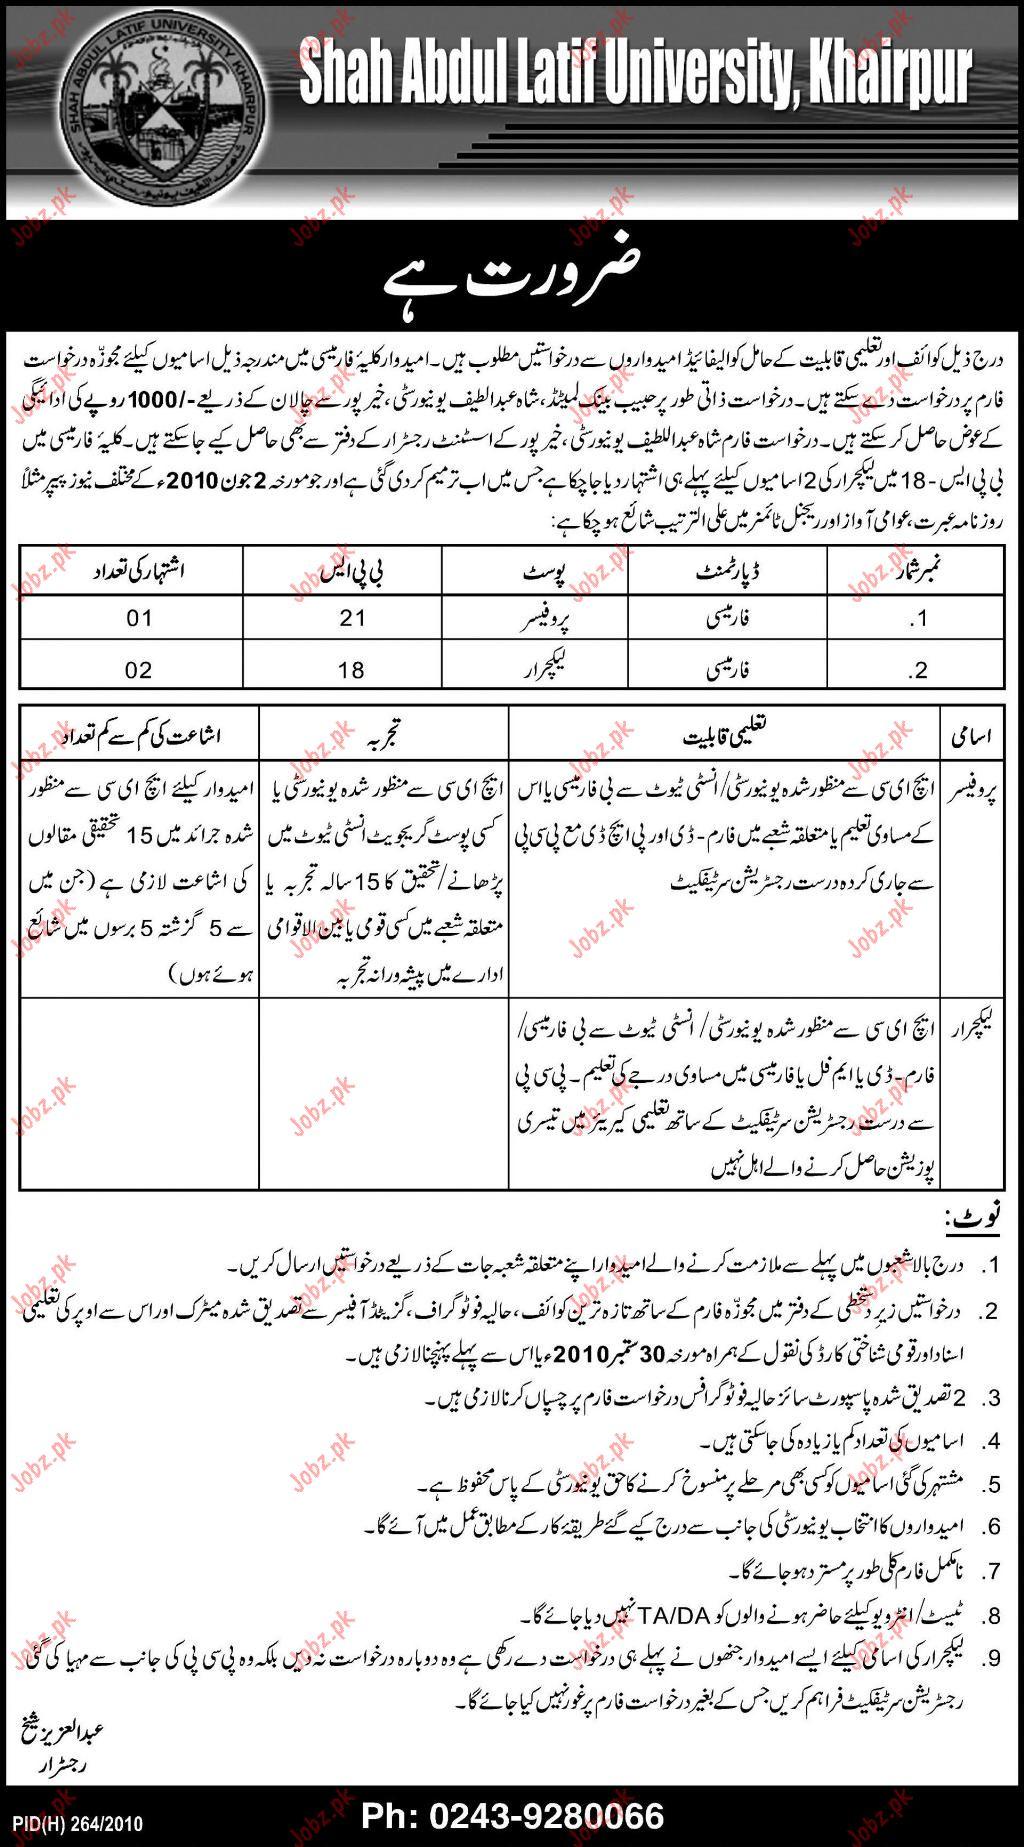 Shah Abdul Latif University Khairpur Job Opportunities